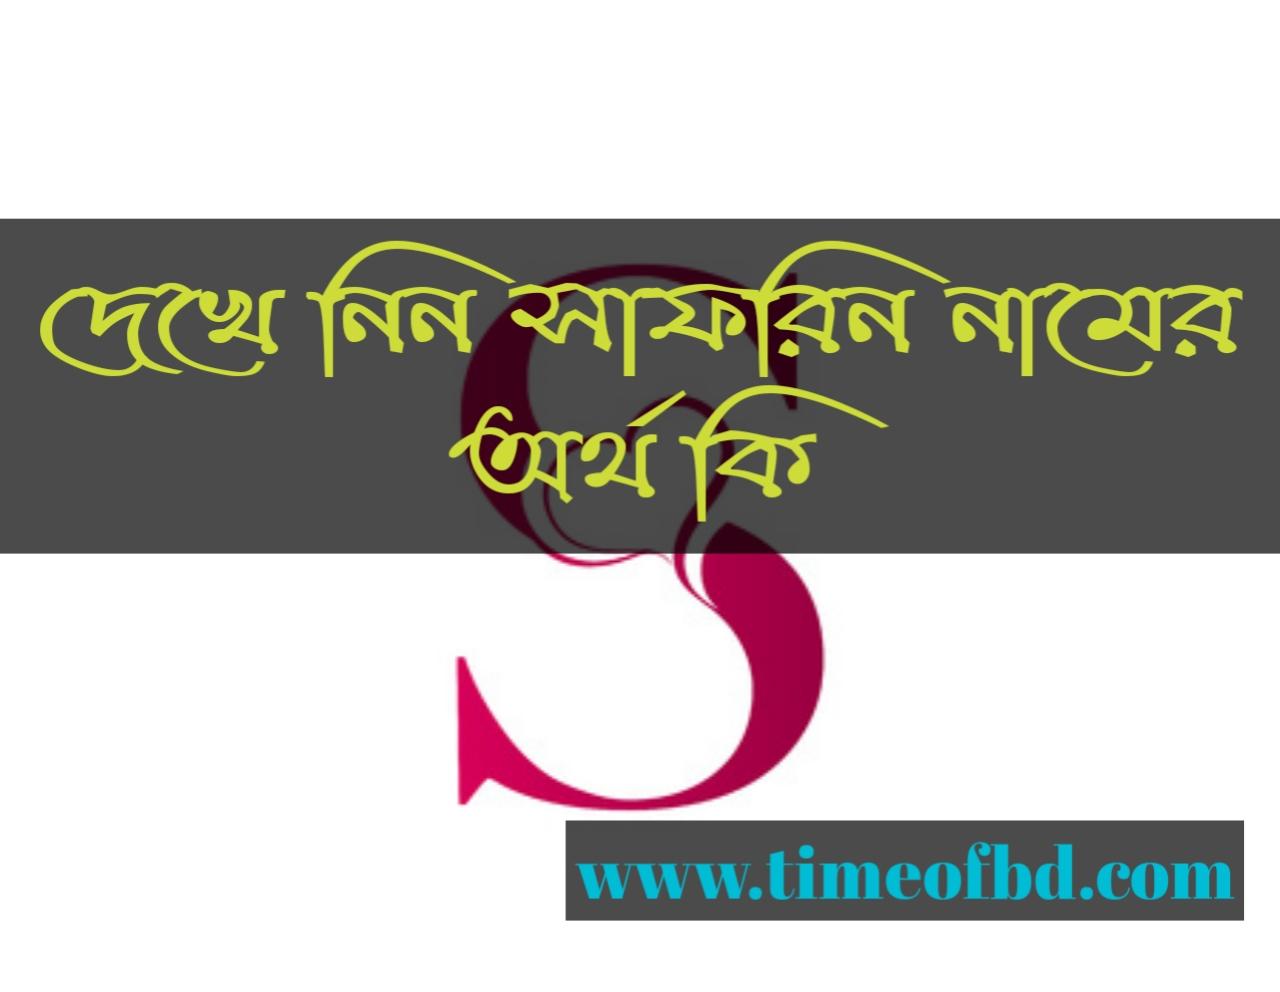 safrin name meaning in Bengali, সাফরিন নামের অর্থ কি, সাফরিন নামের বাংলা অর্থ কি, সাফরিন নামের ইসলামিক অর্থ কি,